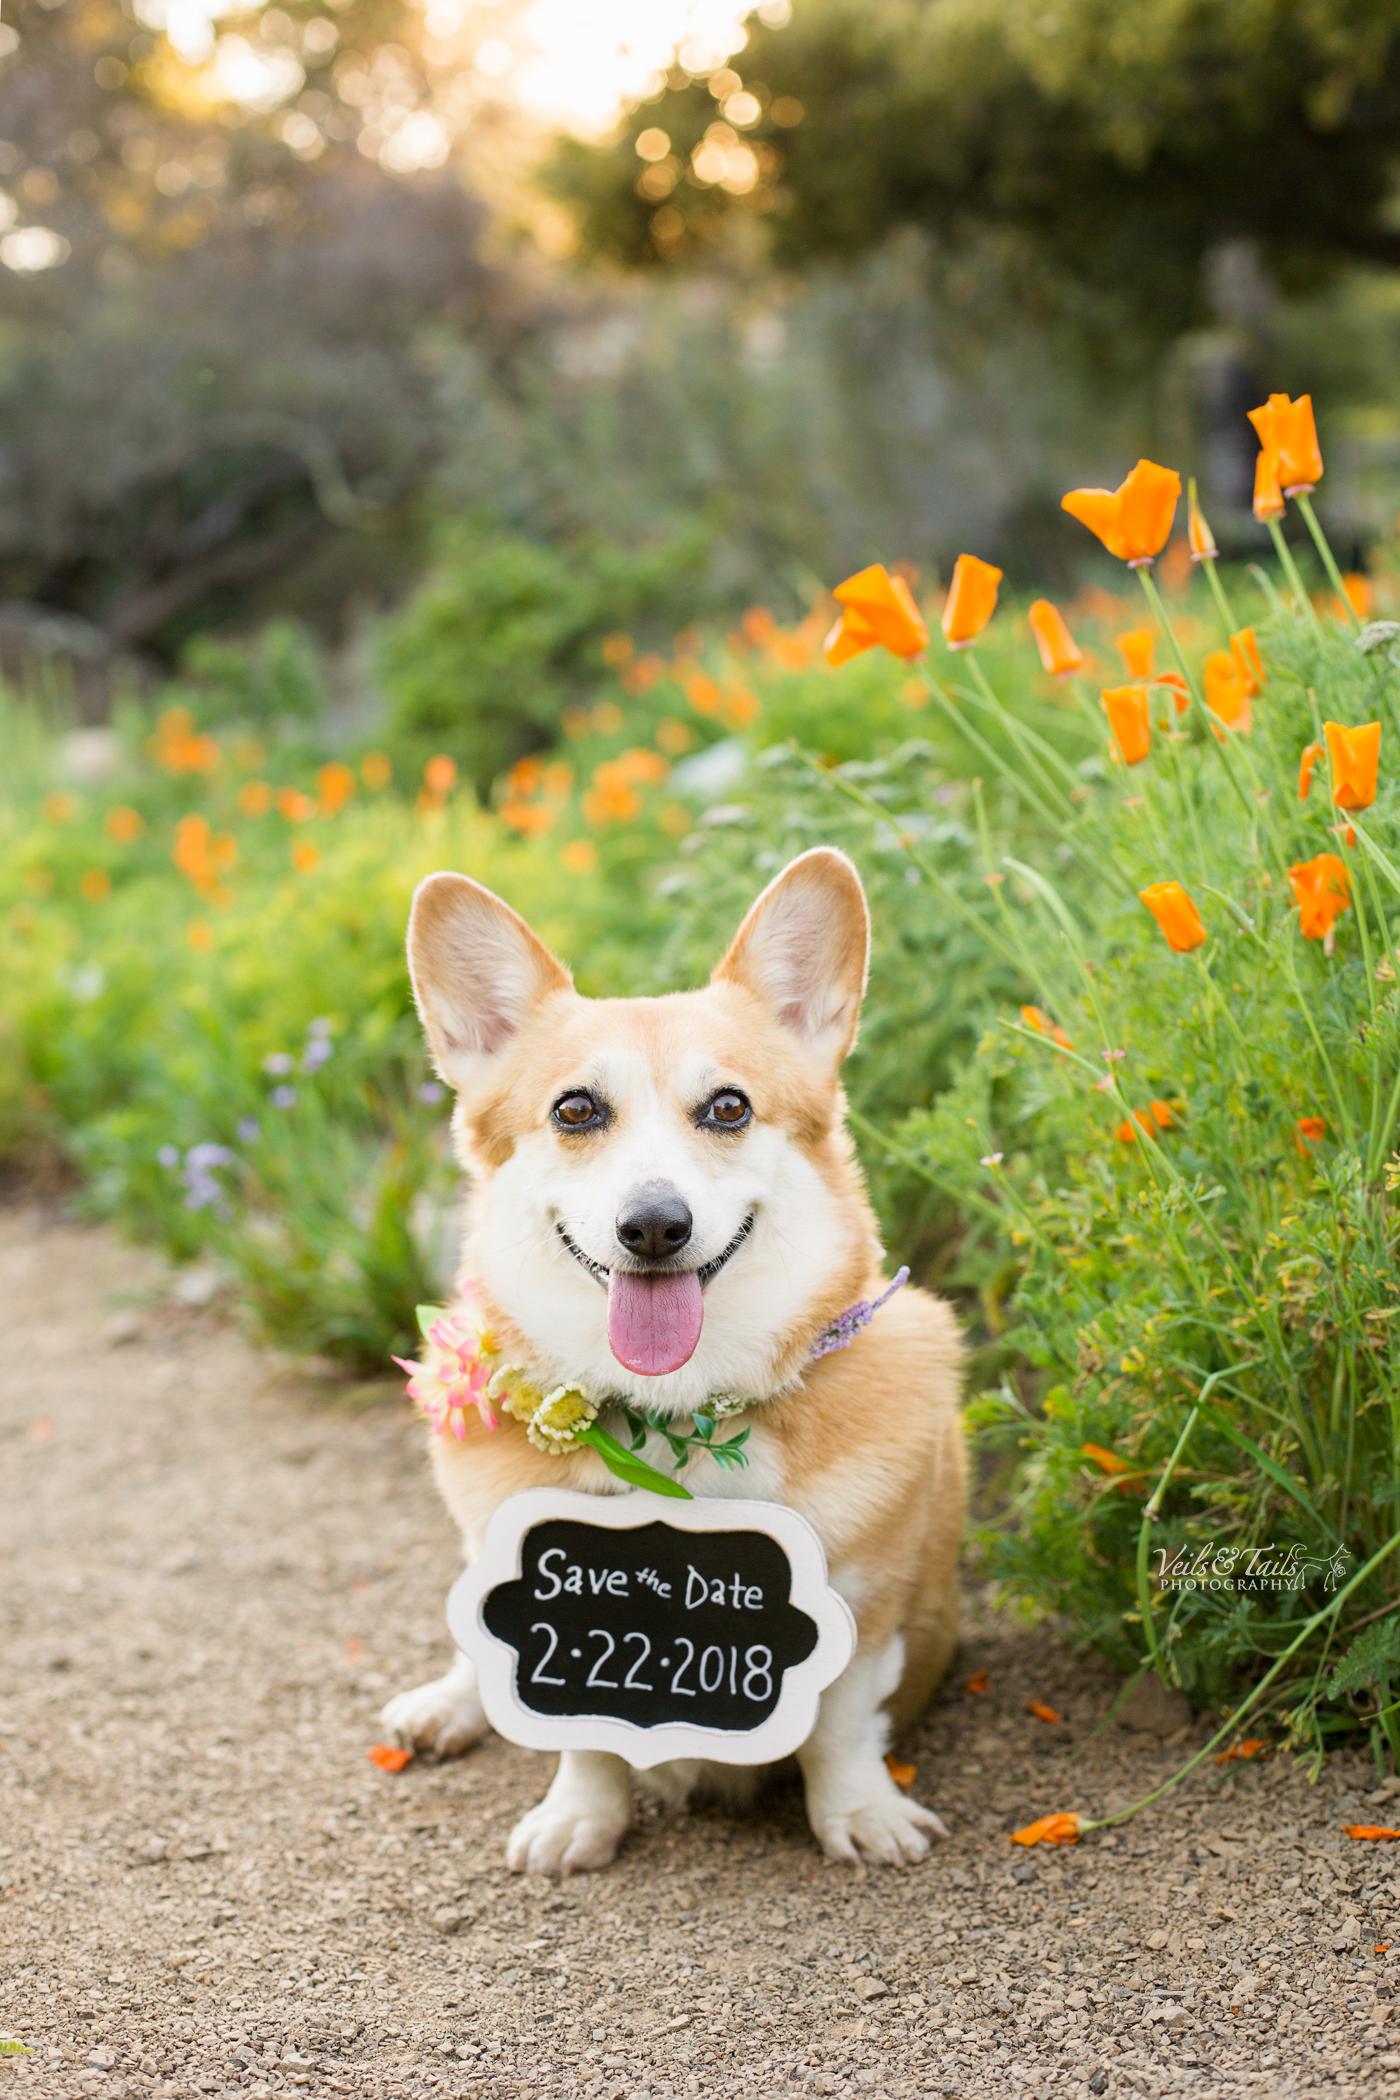 Dog as best man for wedding